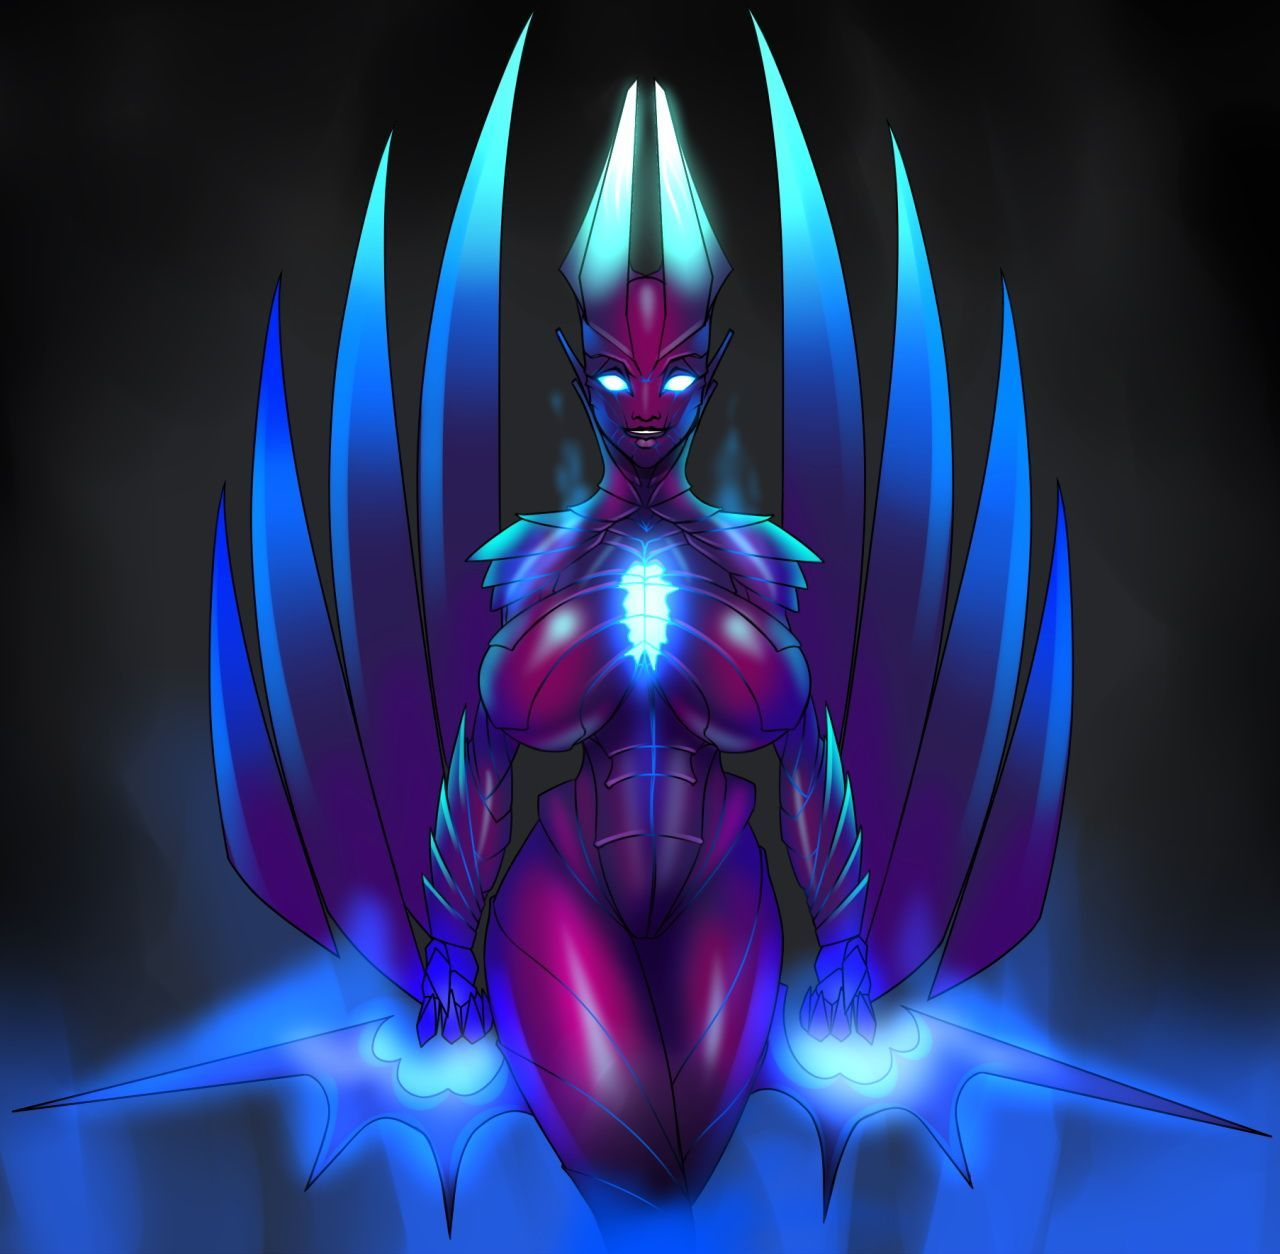 Spectra Hentai